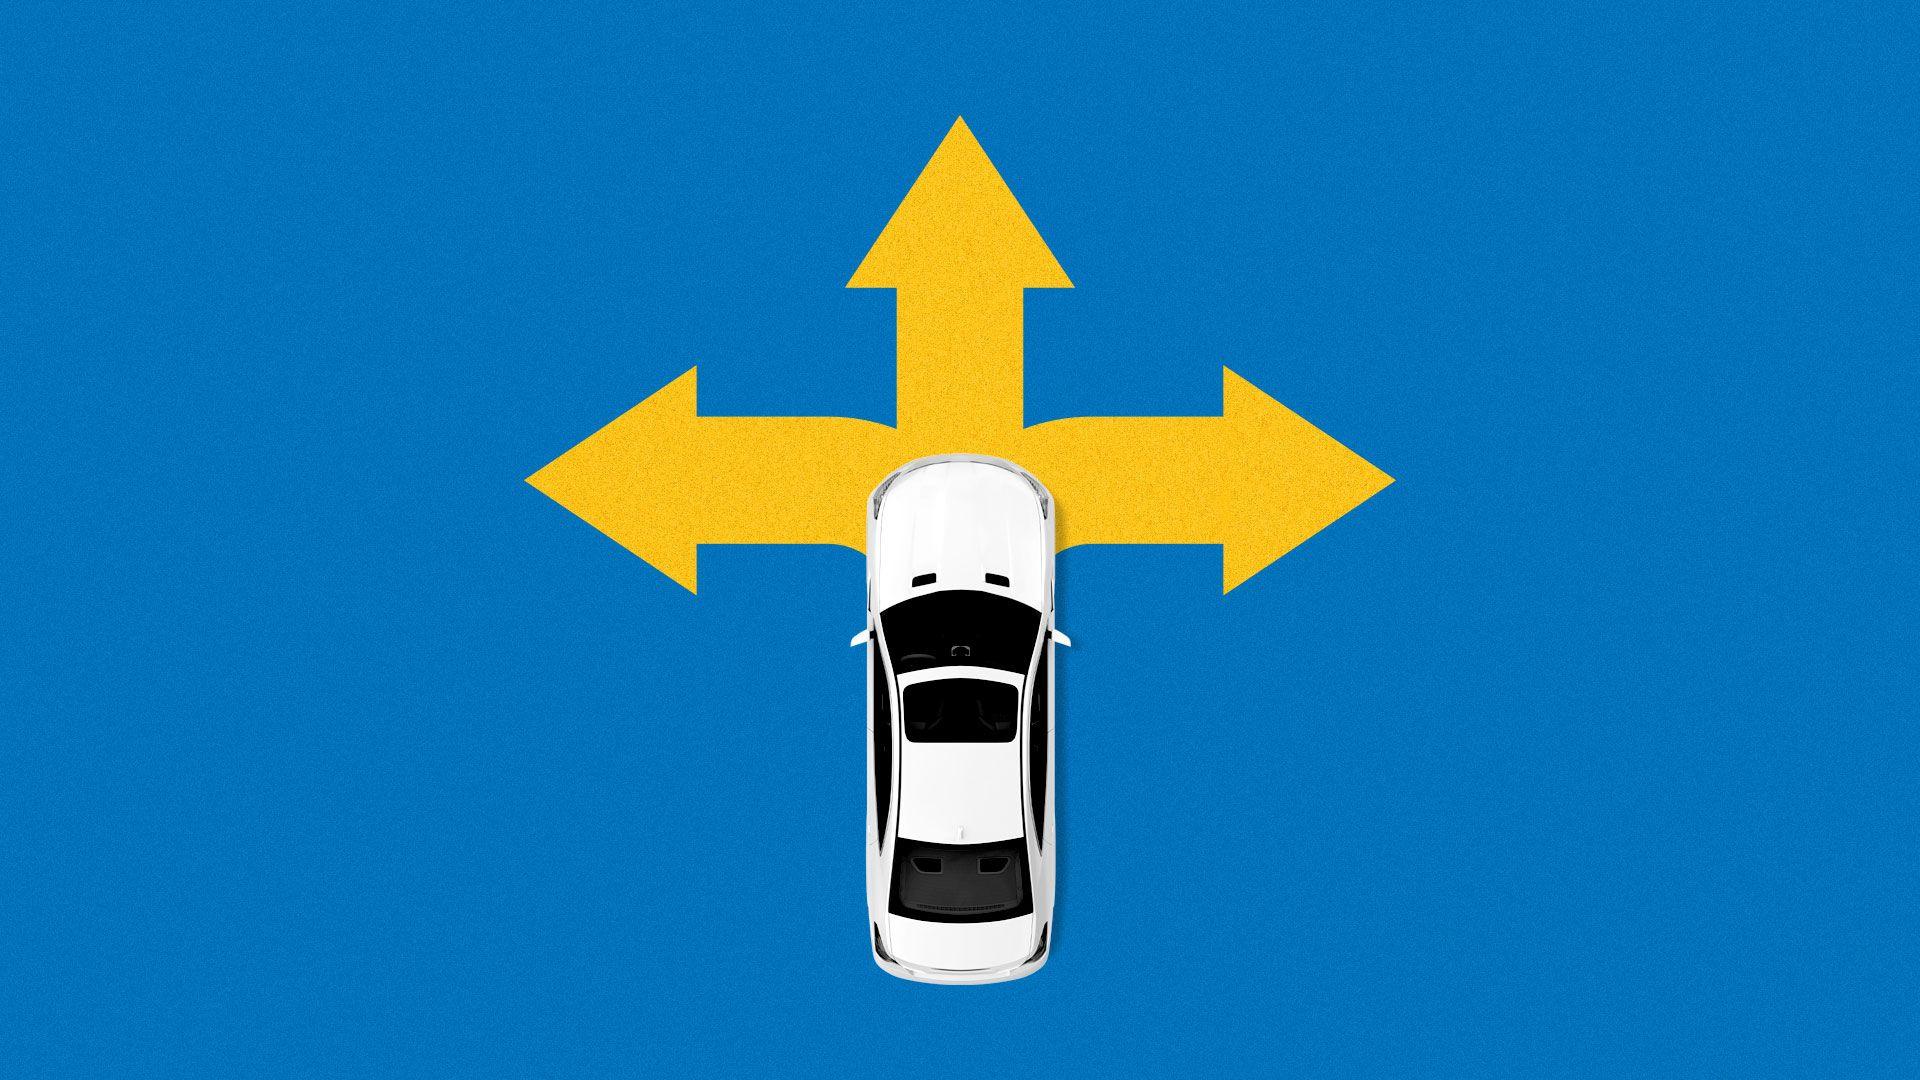 Illustration of car on a three-way street sign.